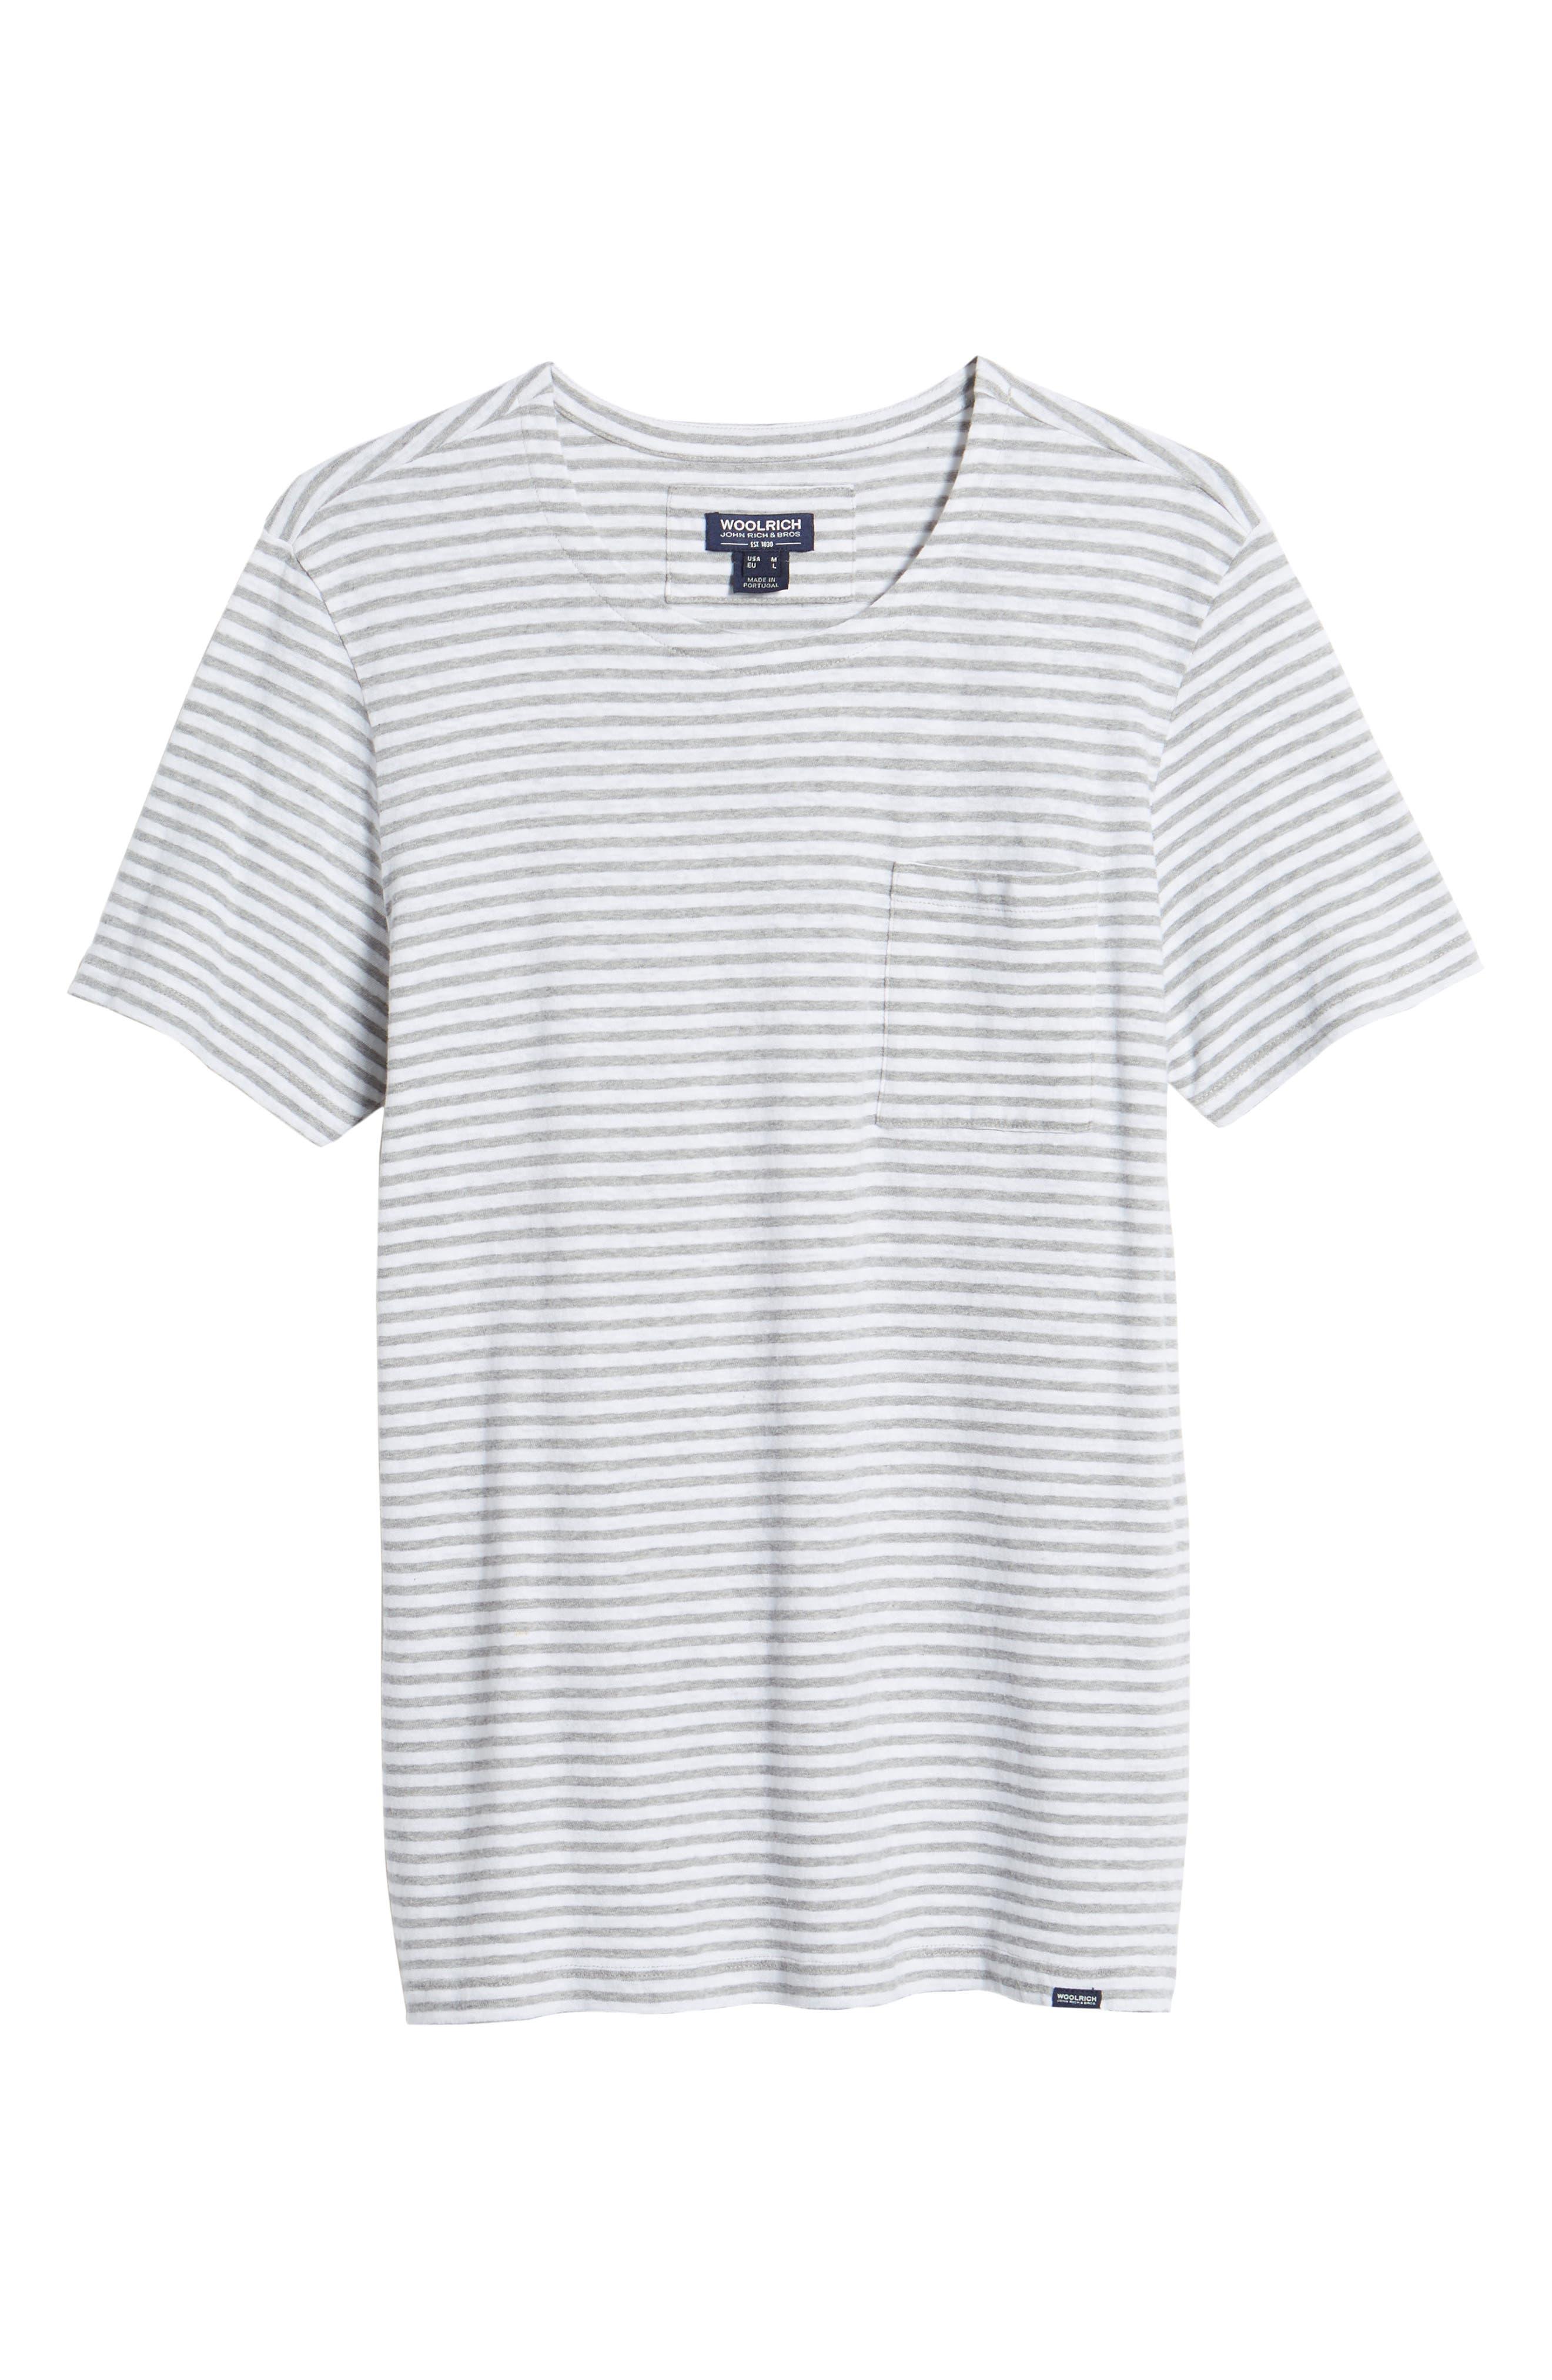 & Bros. Stripe Crewneck T-Shirt,                             Alternate thumbnail 6, color,                             156